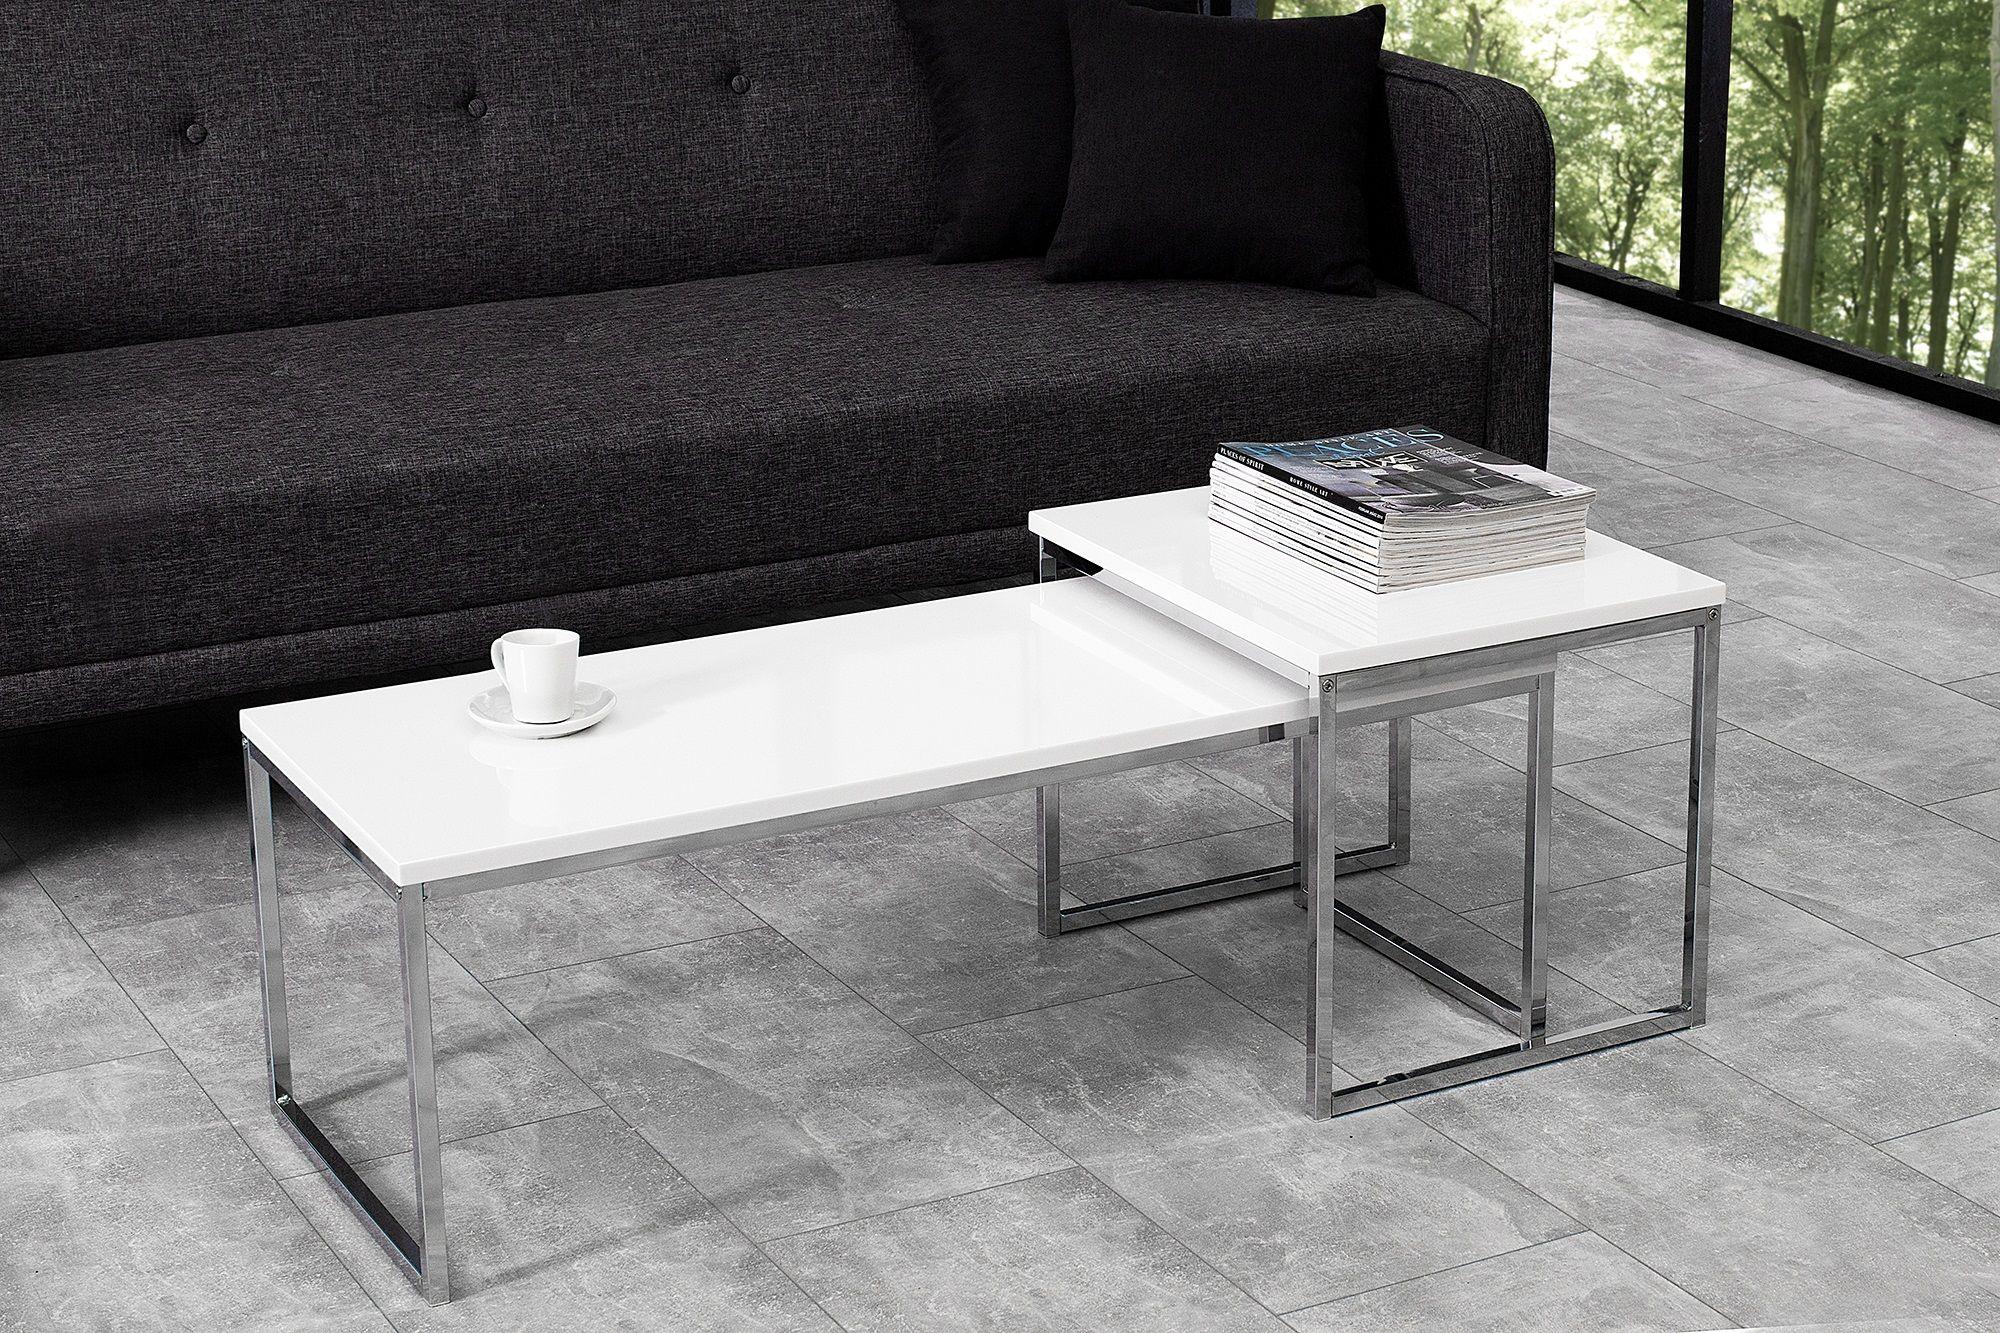 170d8eb72c6242a5ffe3d7ab4d2aa812 Top Result 50 Luxury Black and White Coffee Table Image 2017 Shdy7